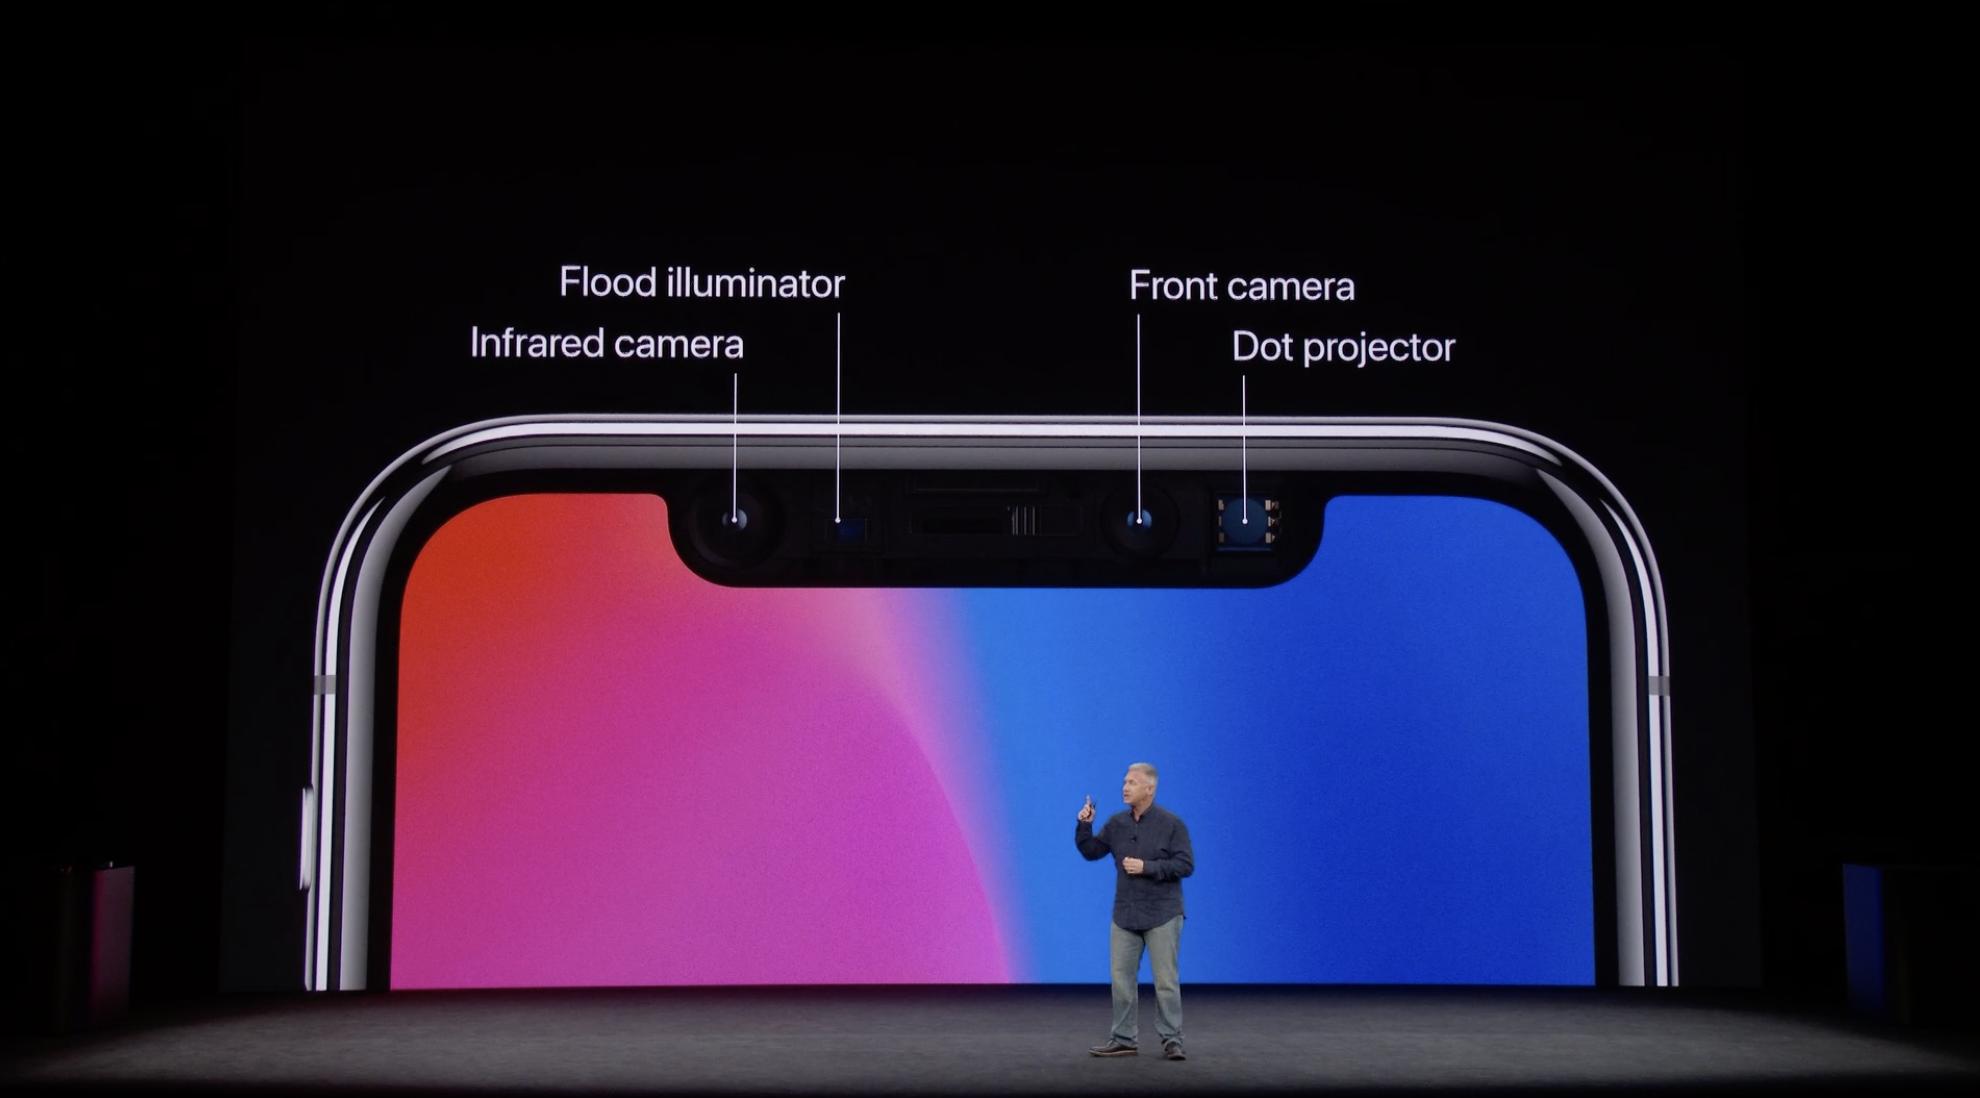 iPhone X True Depth Camera System components